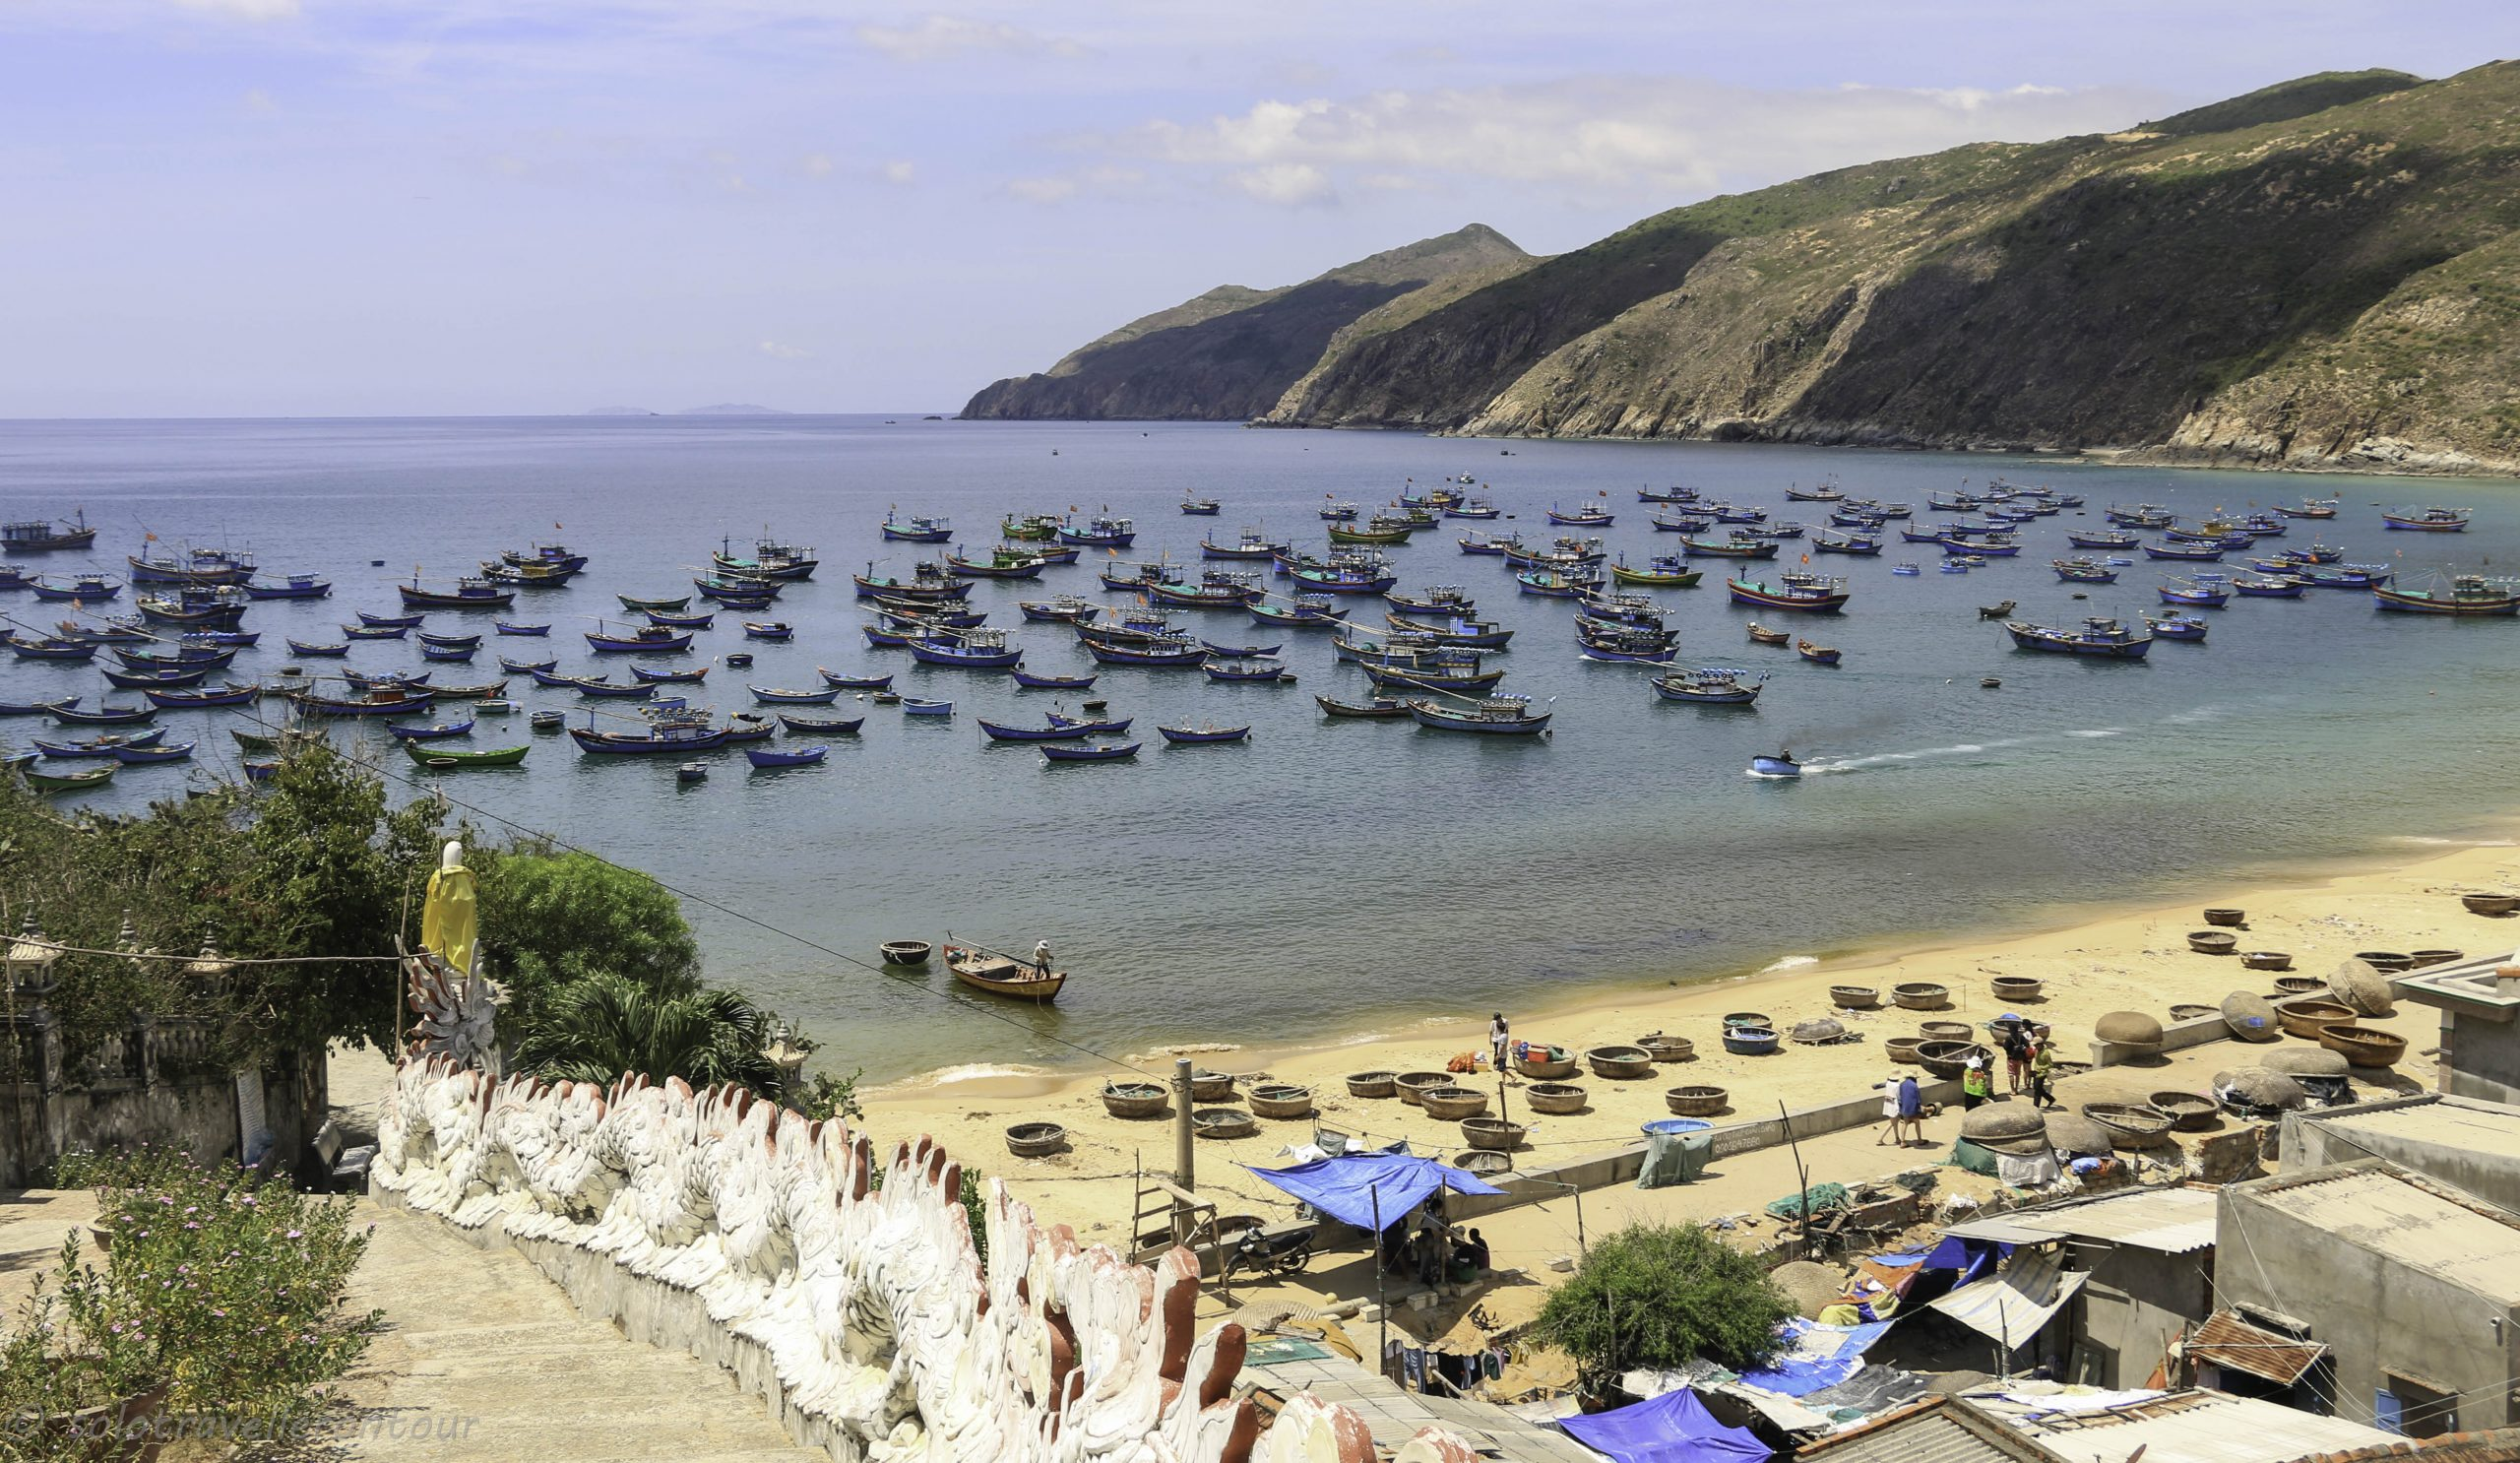 7. Quy Nhon – a hidden gem on the coast